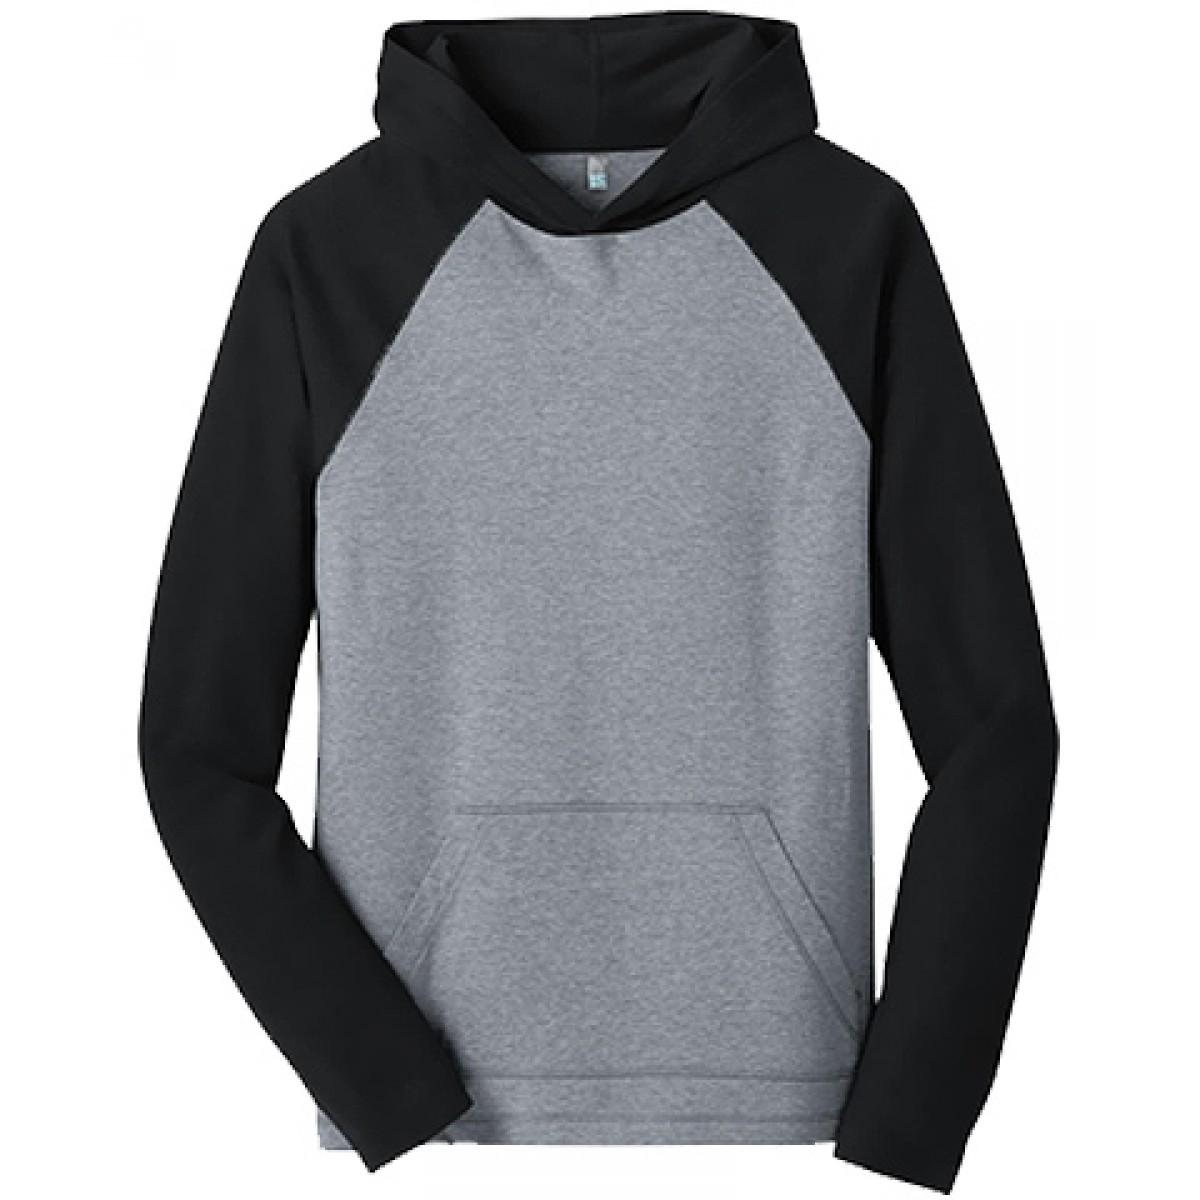 50/50 Raglan Hoodie-Gray/Black-XL